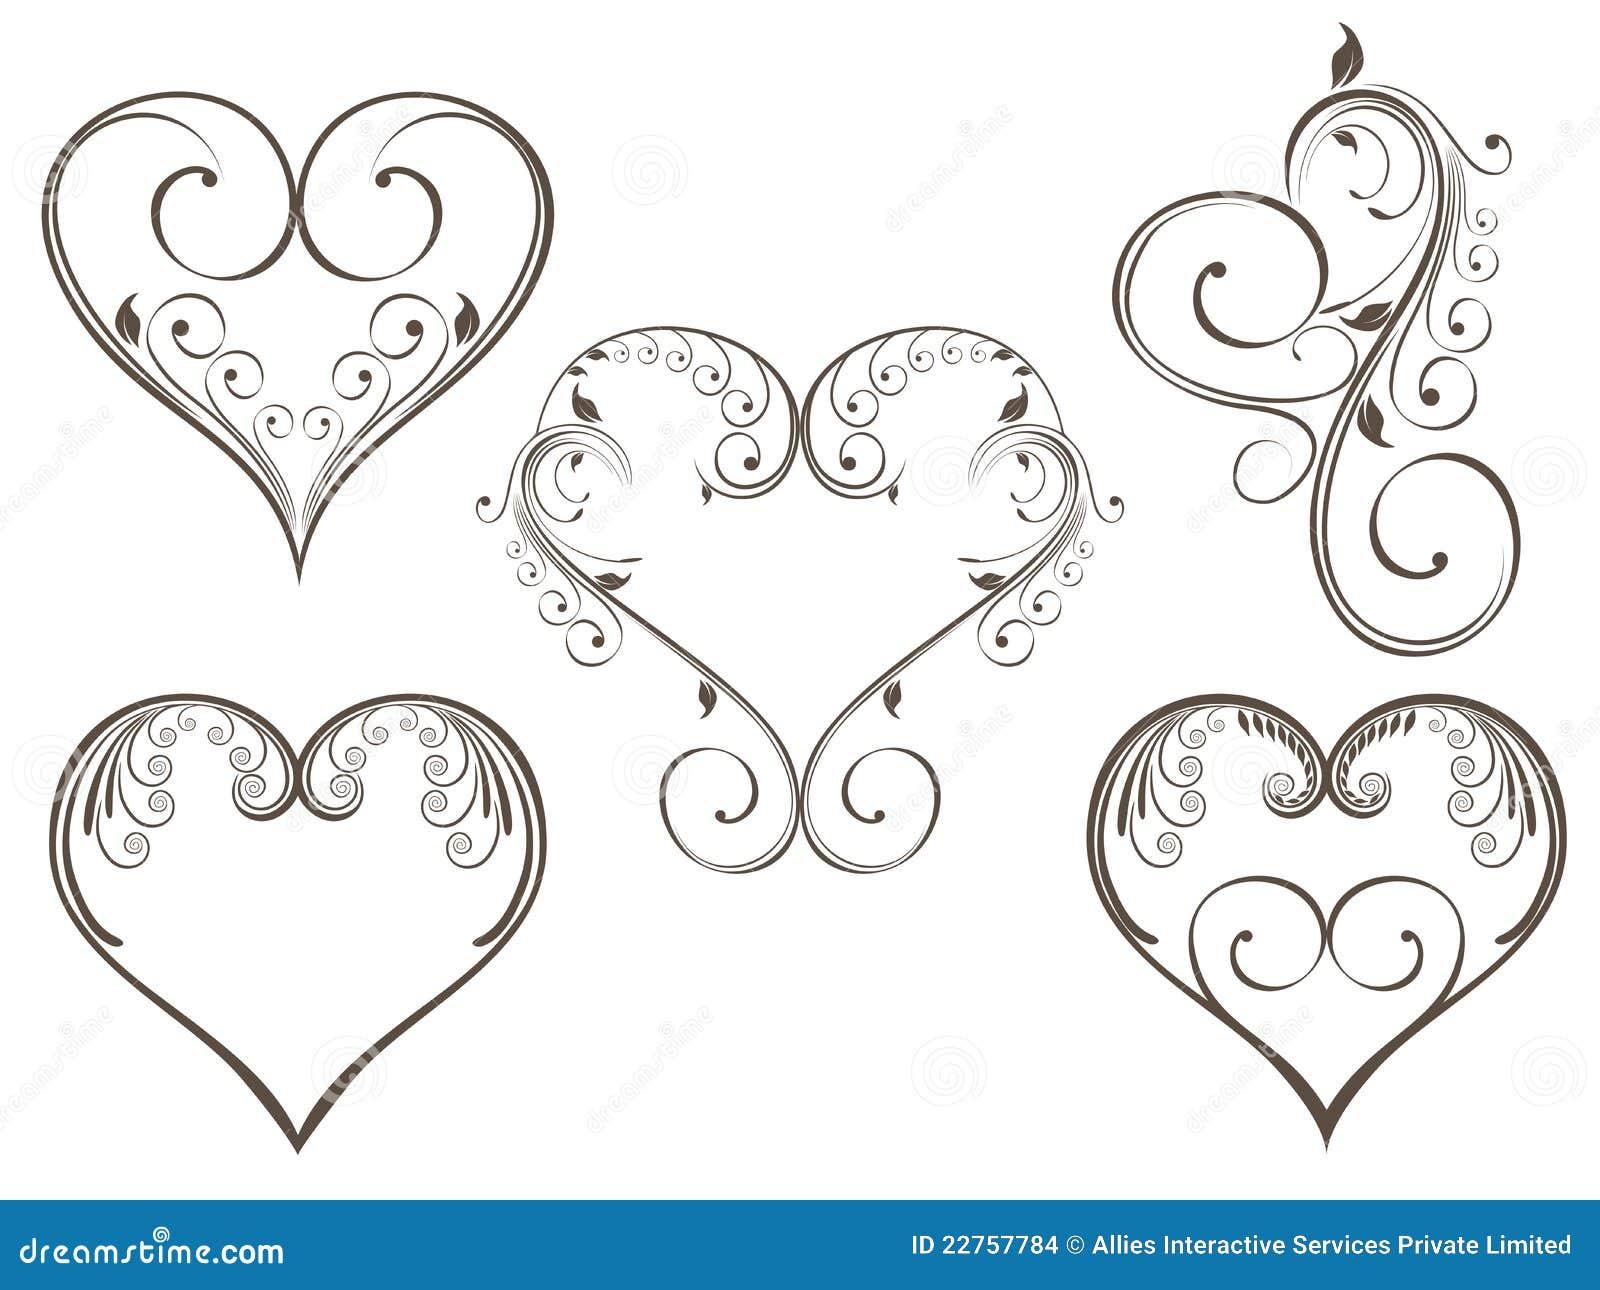 Heart Line Art Design : Floral heart scrolls stock vector illustration of